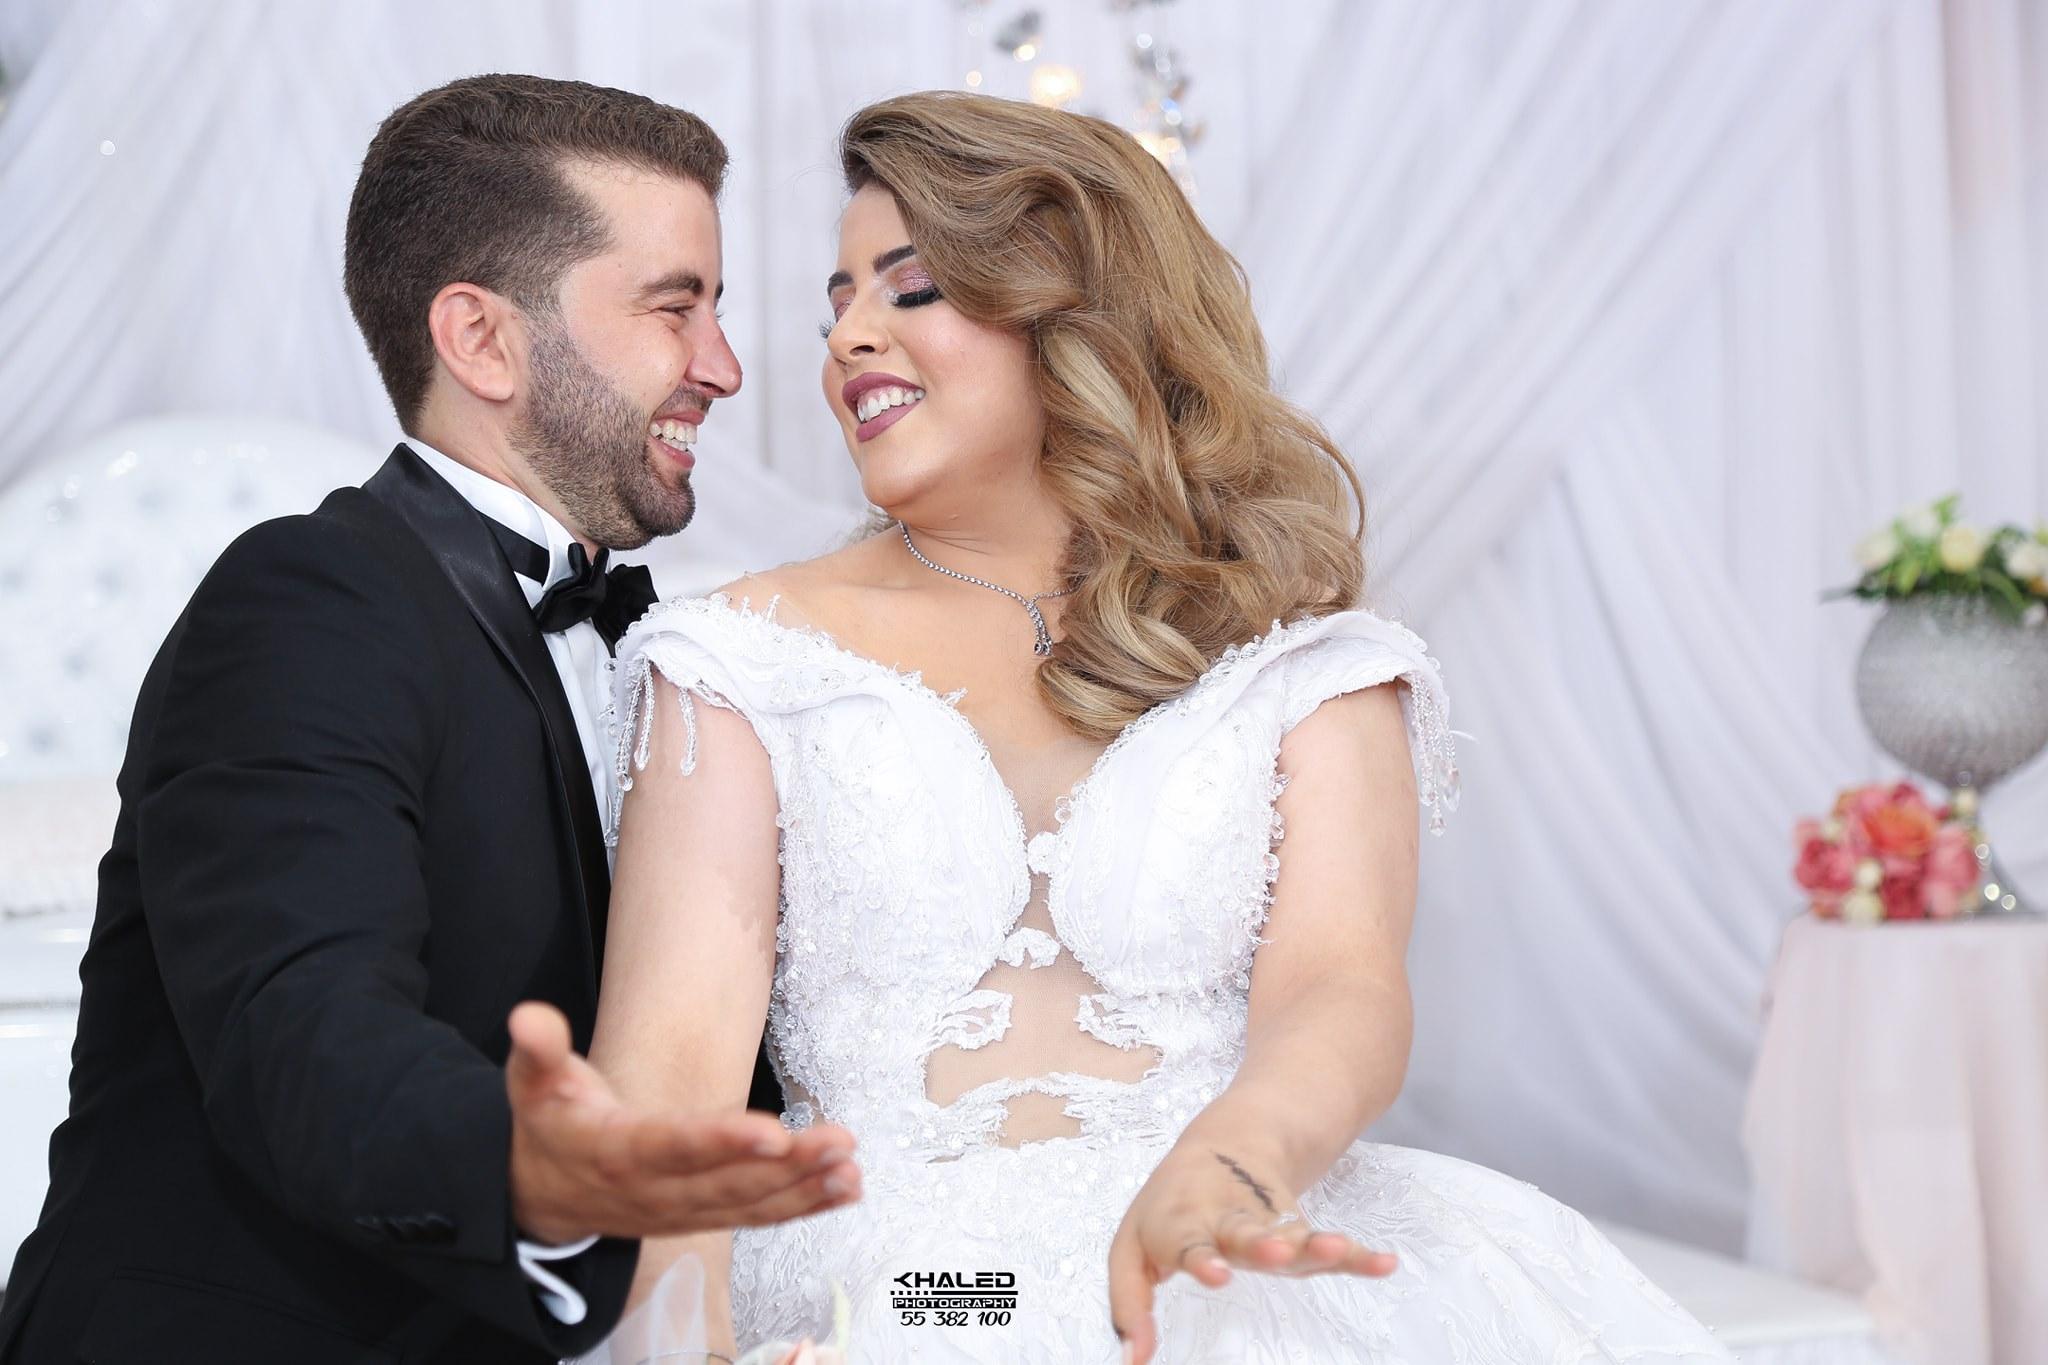 fida16_plus_belles_mariées_tunisiennes_186_2019